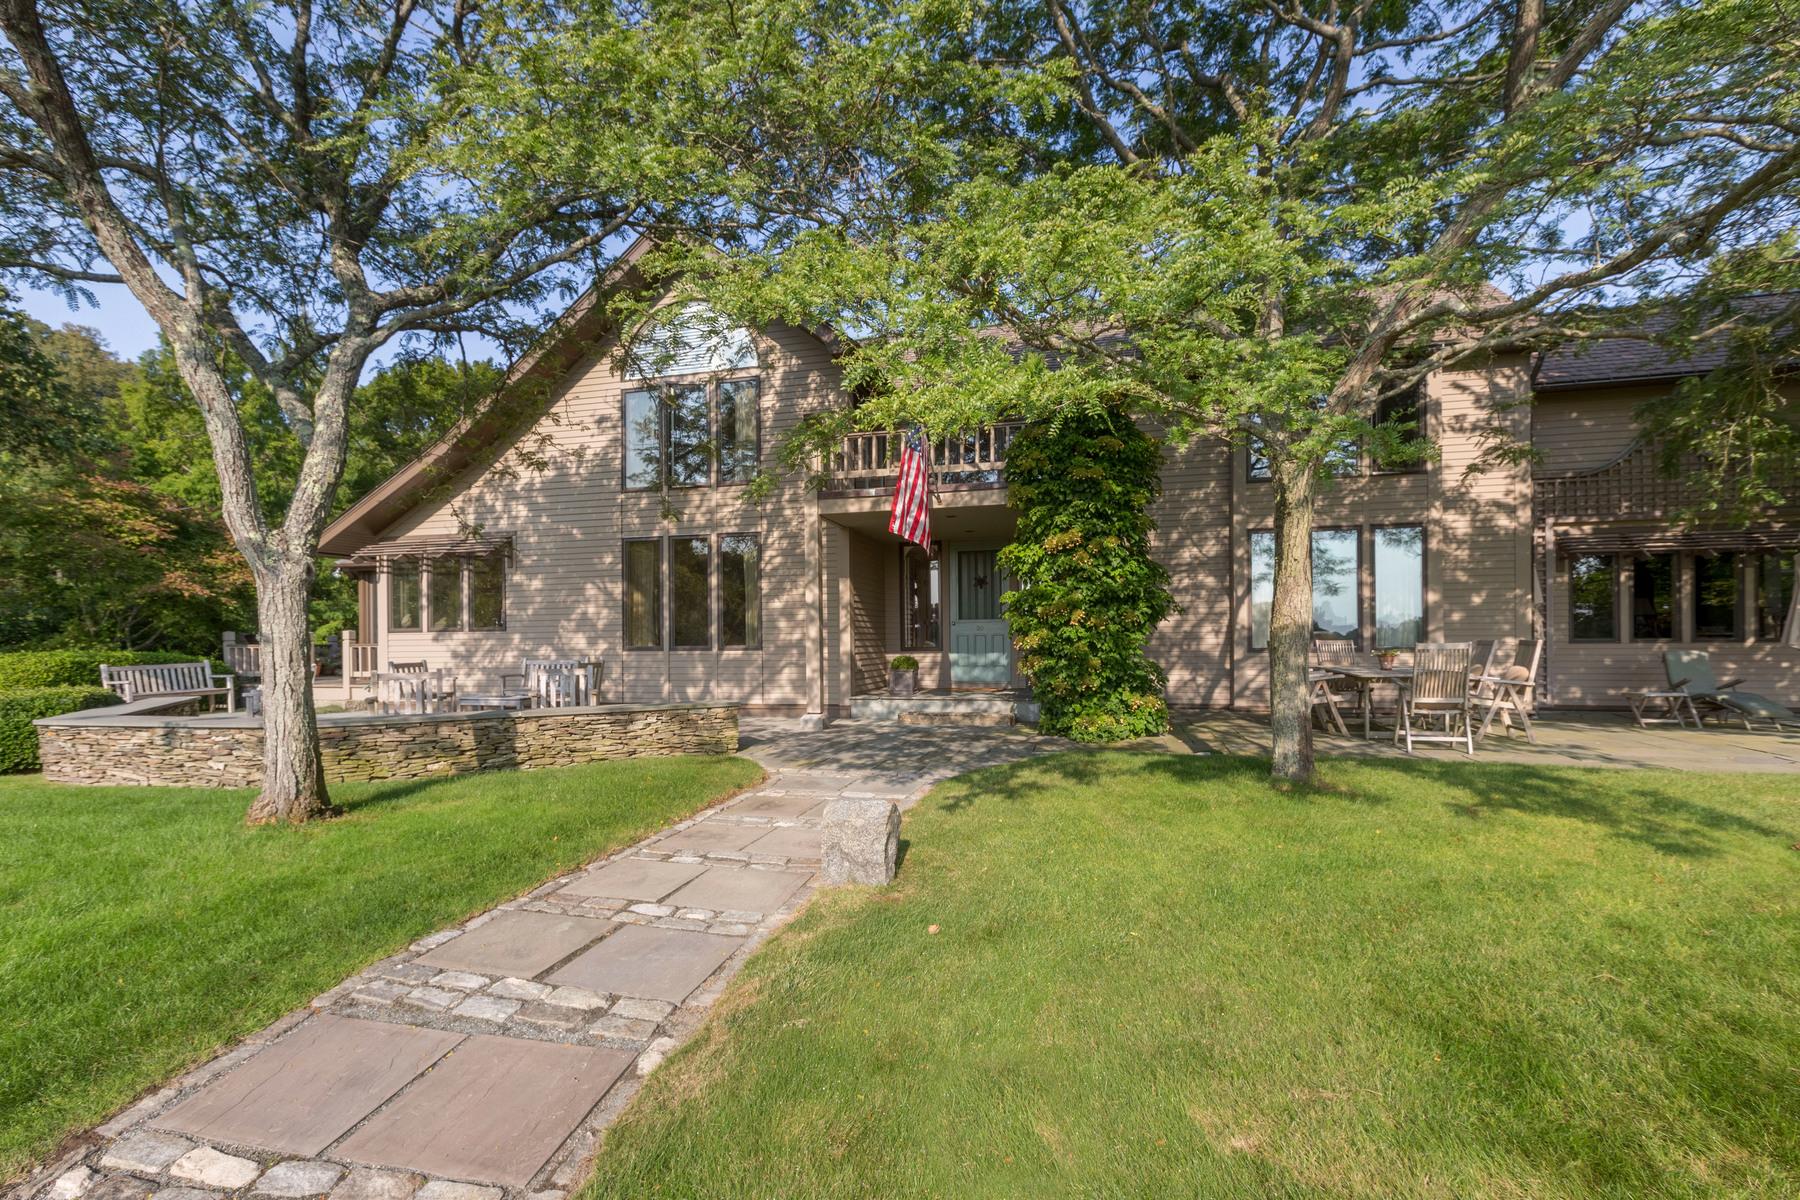 独户住宅 为 销售 在 Overlooking Picturesque Salt Marshes 20 Ocean Street 曼彻斯特, 马萨诸塞州, 01944 美国